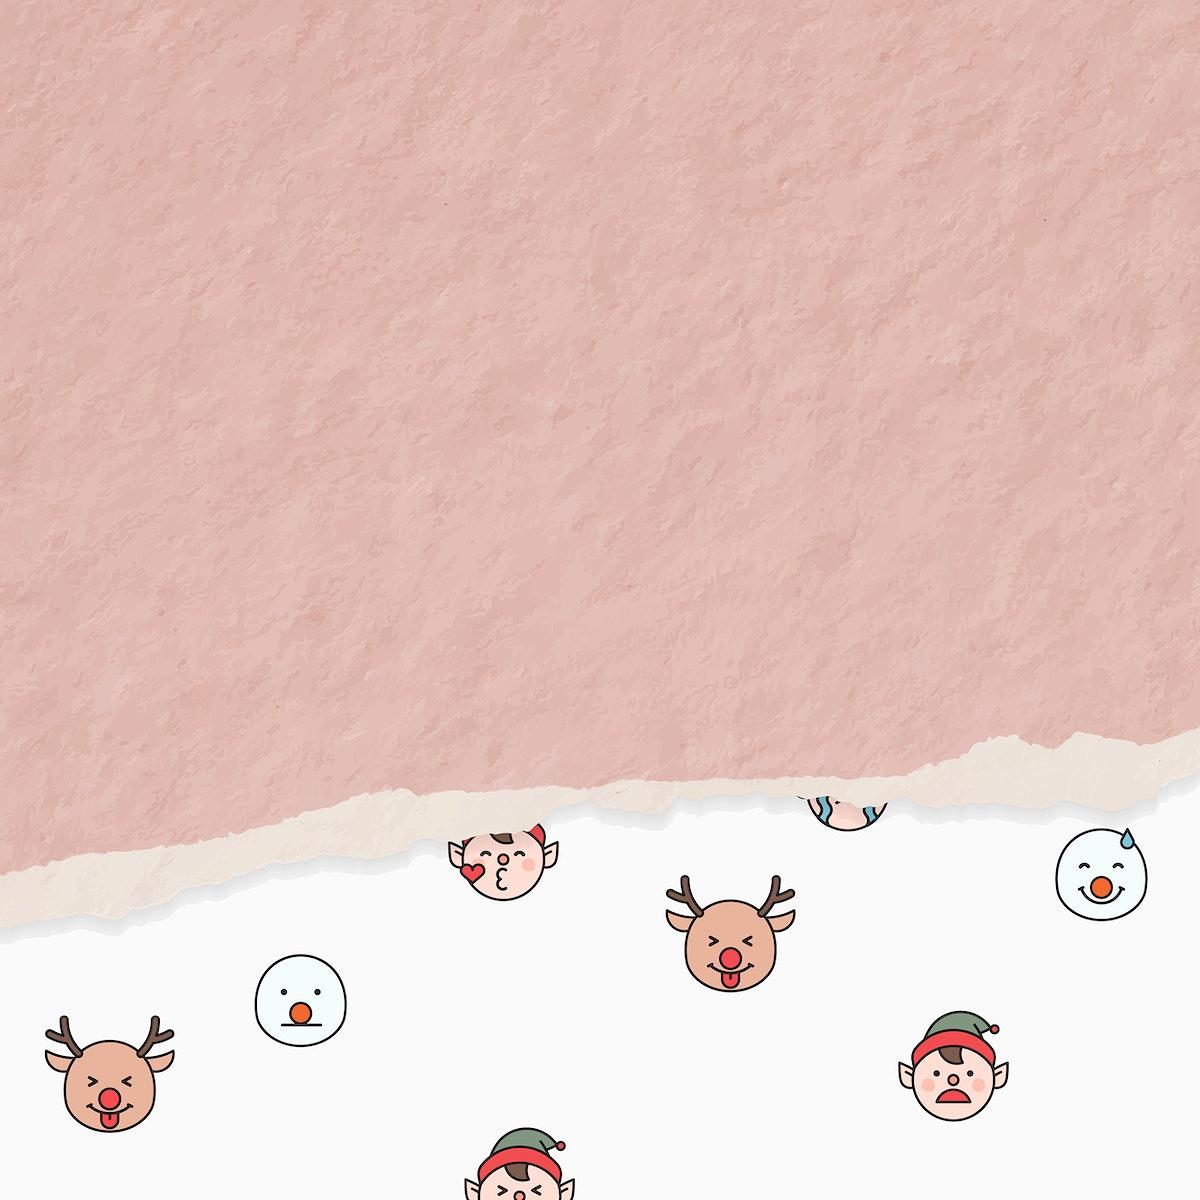 Santa, Rudolph reindeer and elf emoticon patterned background vector